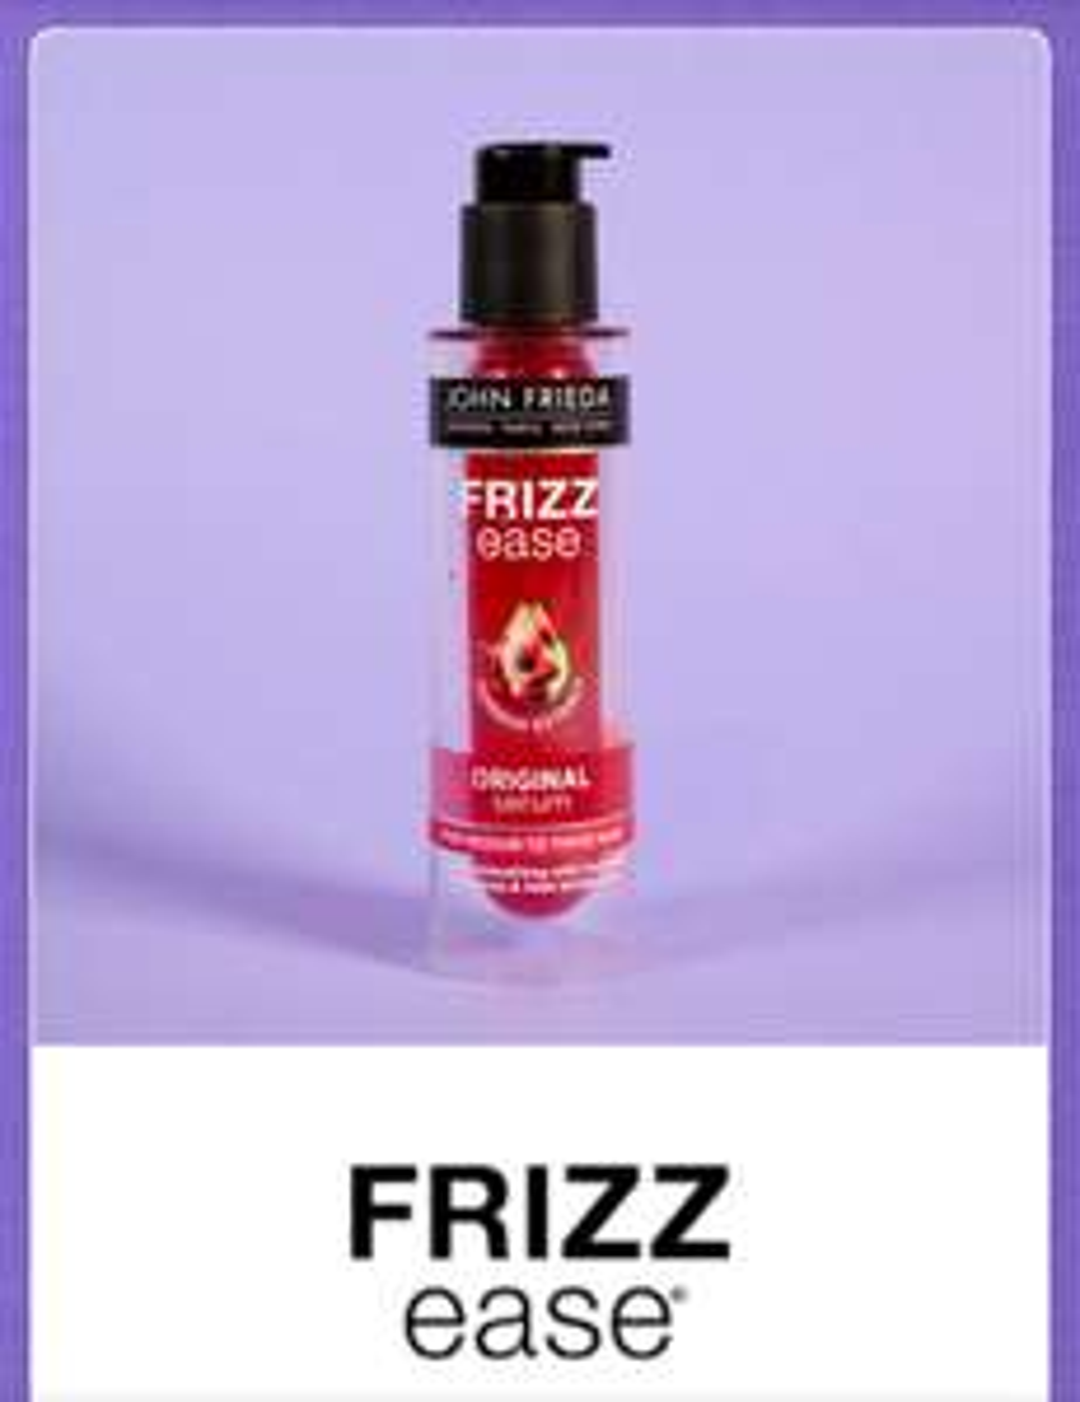 John Freida Frizz ease sample